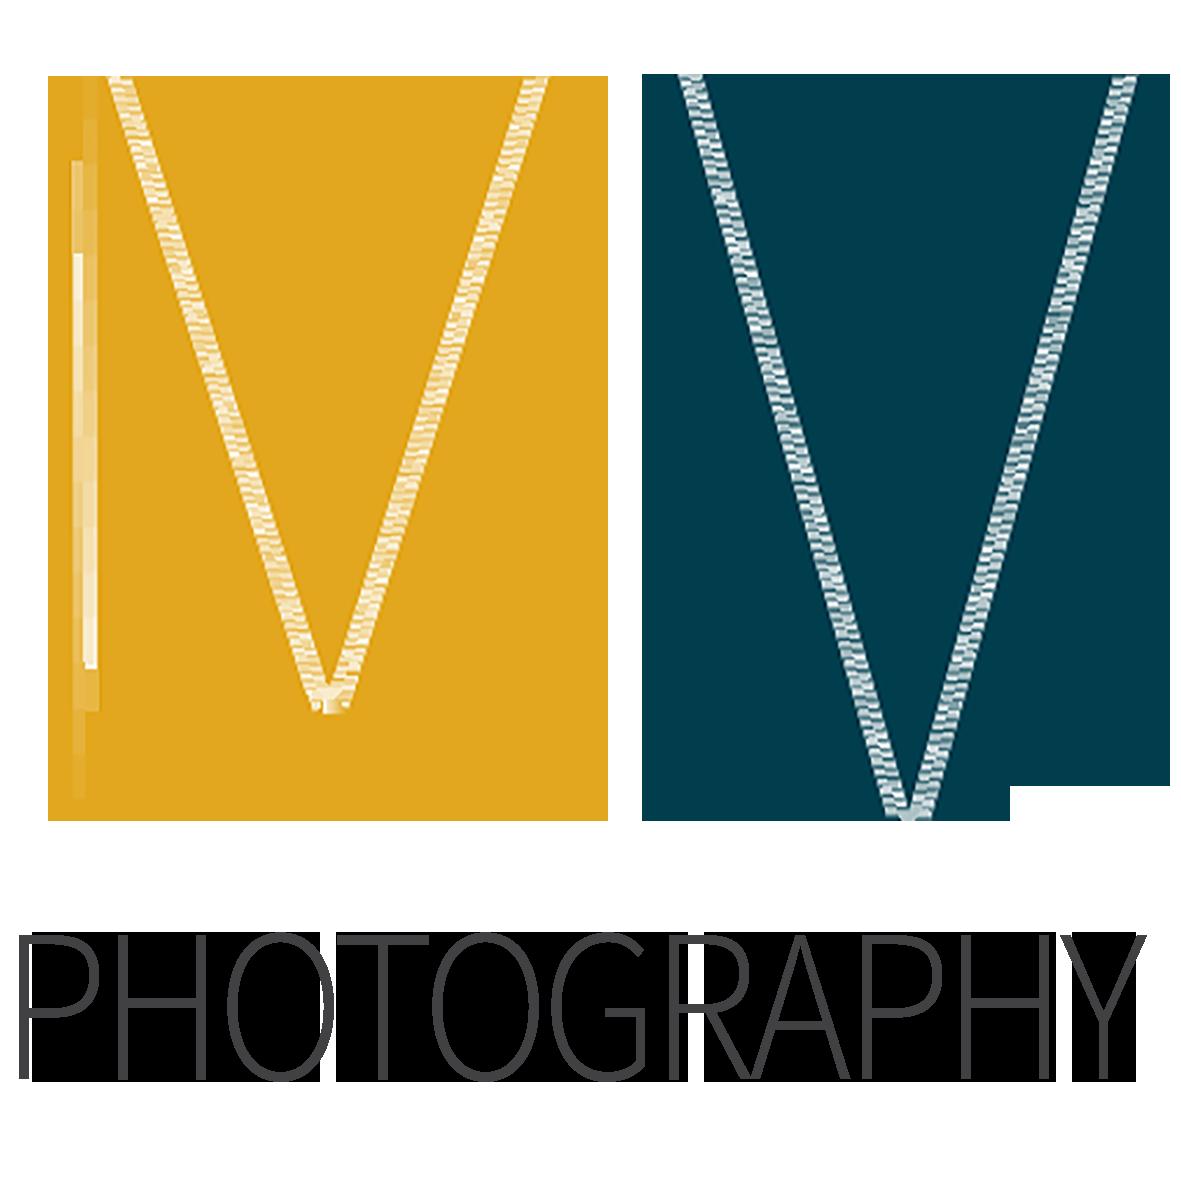 Marni V Photography